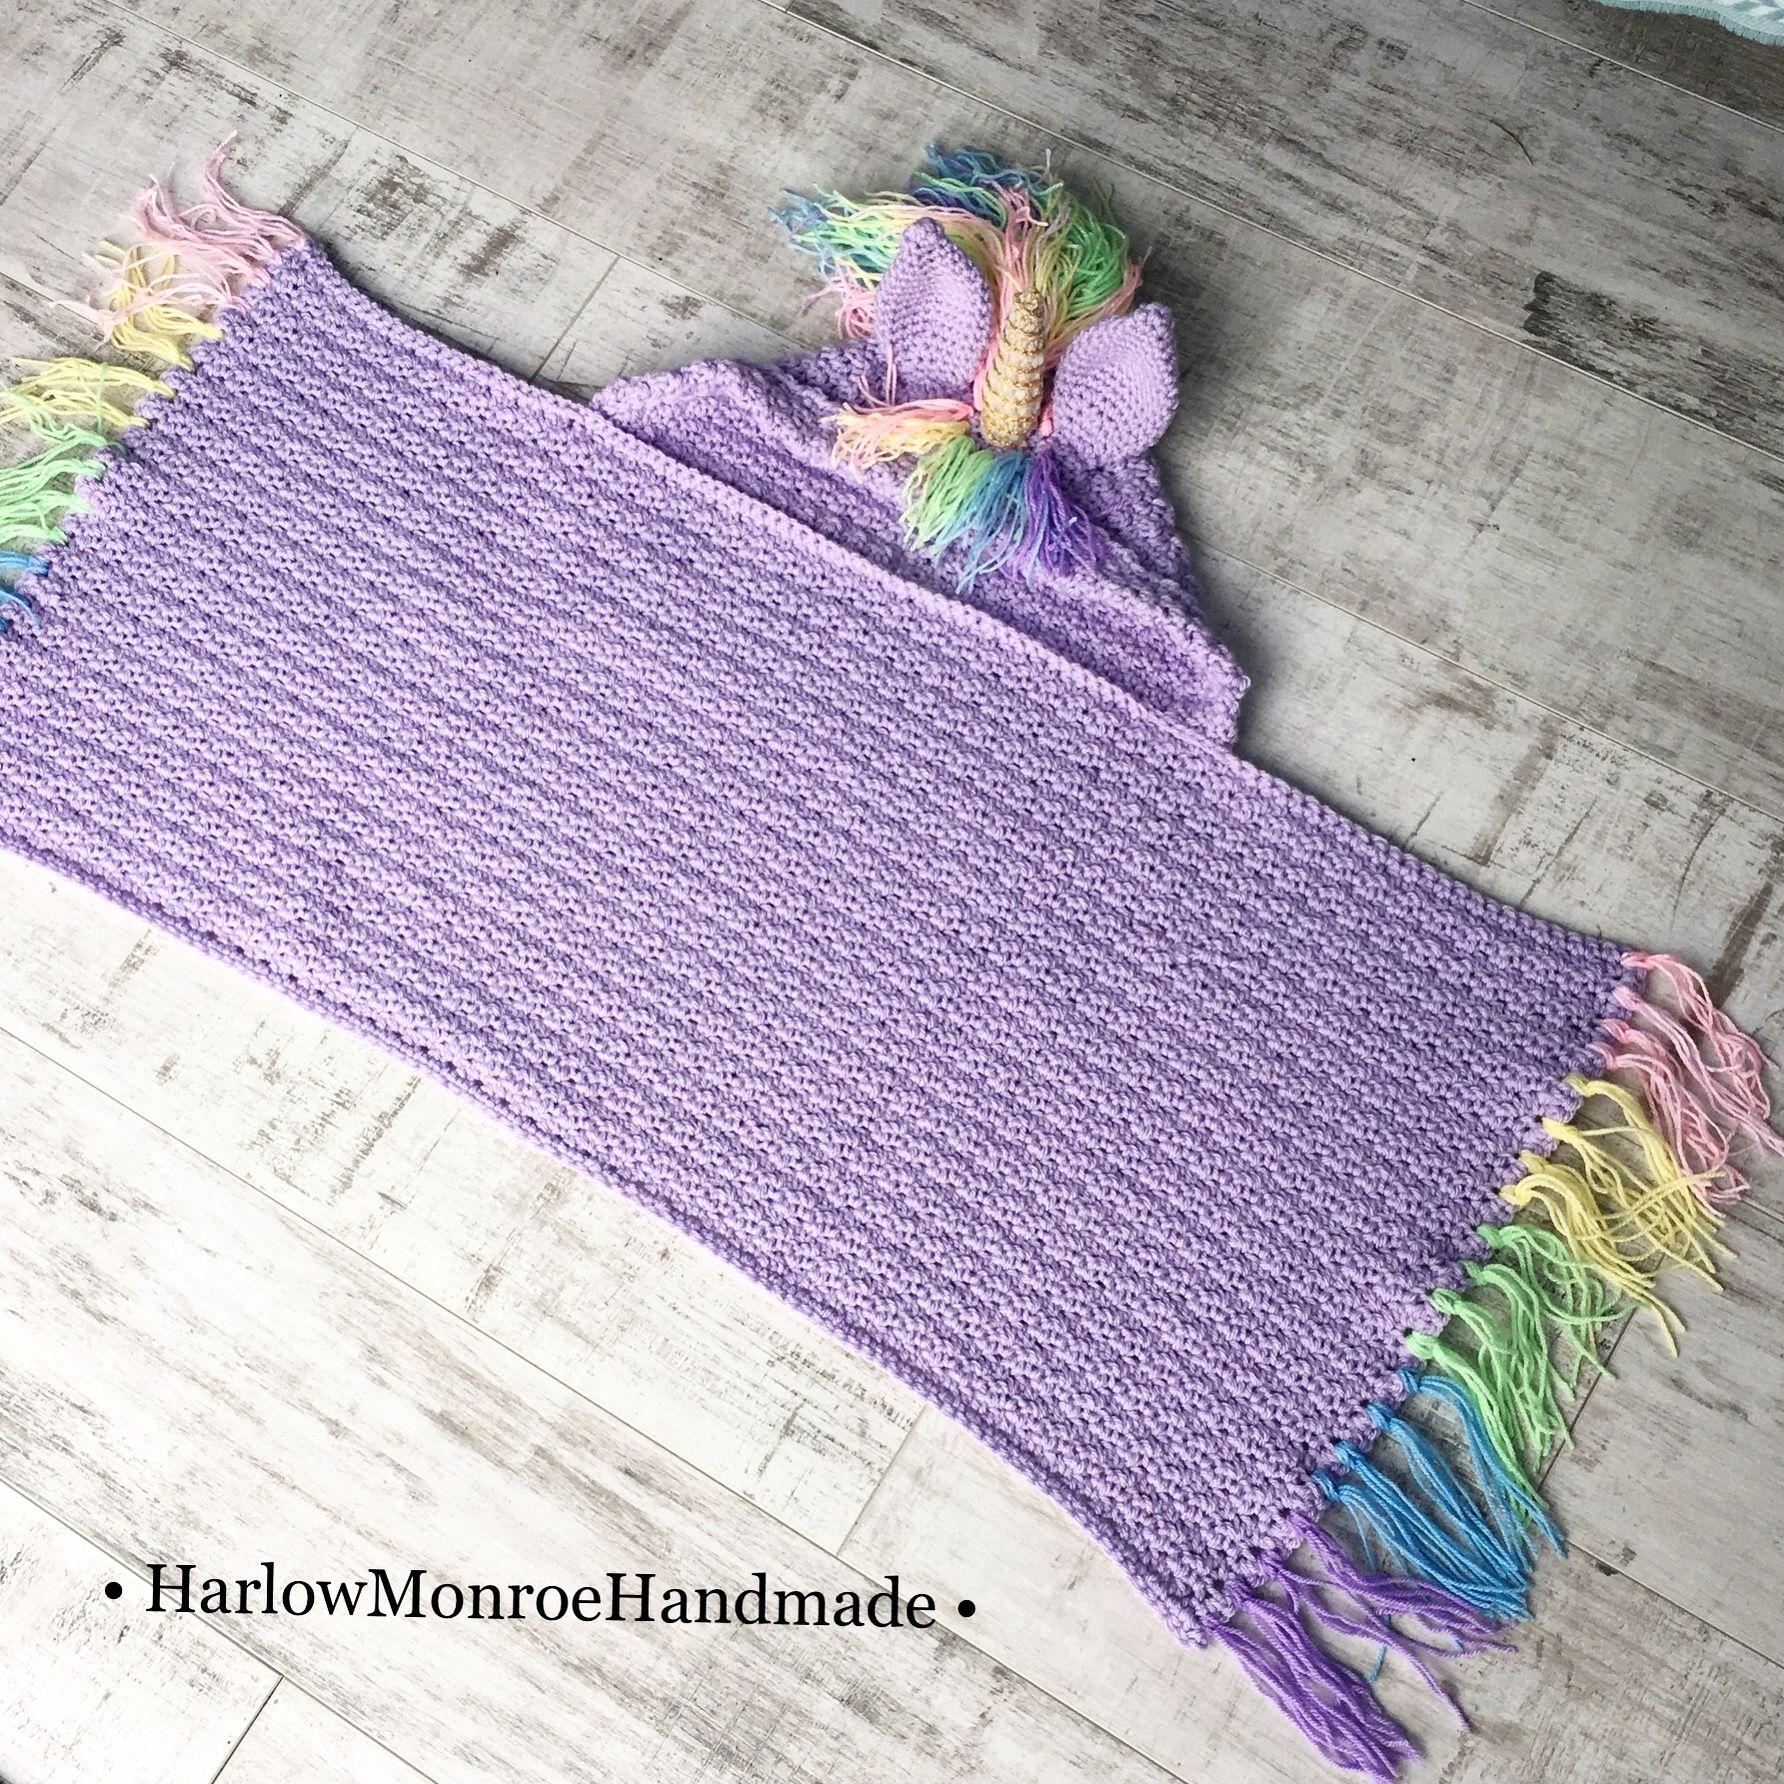 Pin by Harlow Monroe Handmade on Patterns by Harlow Monroe ...